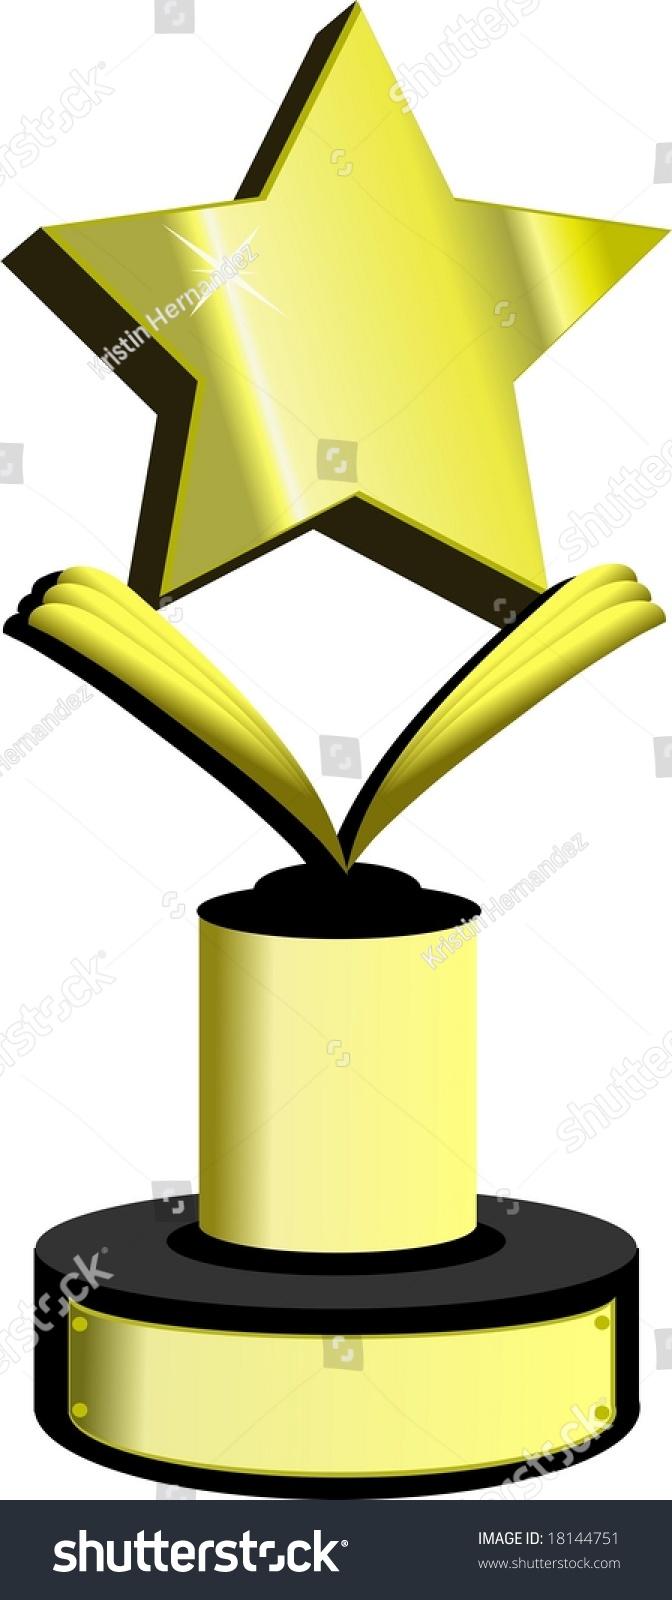 gold star award trophy stock illustration 18144751 shutterstock rh shutterstock com